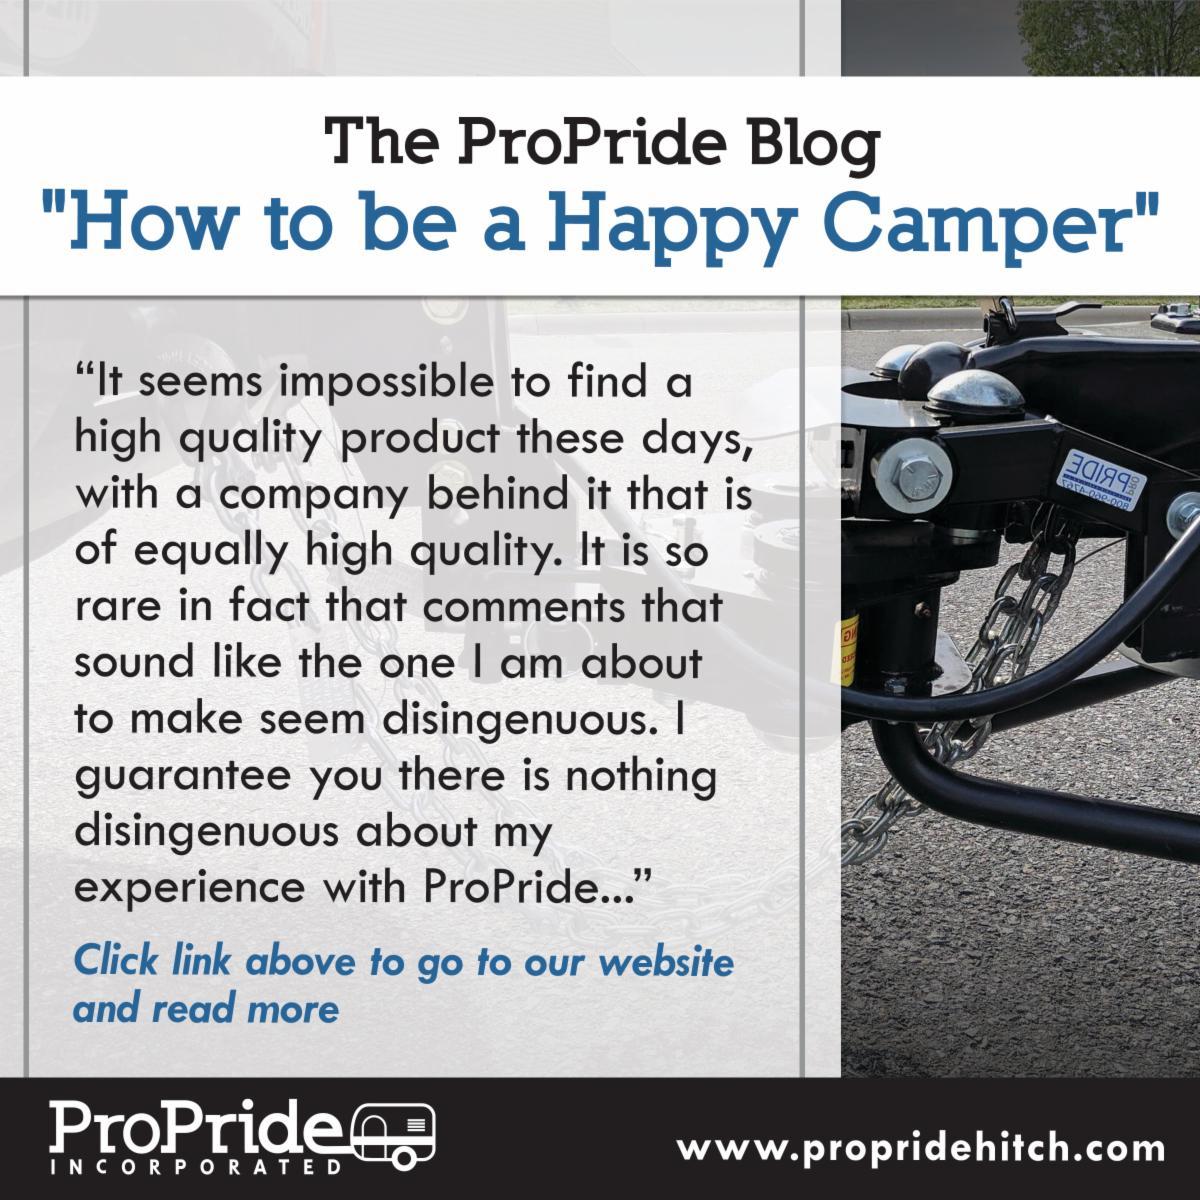 How To Be A Happy Camper https://blog.propridehitch.com/how-to-be-a-happy-camper… . #propridehitch #propride3phitch #rving #rvlife #rvliving #rvnomads #rvtravel #gorving #fulltimervers #airstream #weightdistribution #trailerlife #wanderlust #homeiswhereyouparkit #letsgosomewhere pic.twitter.com/ncLuolka7x